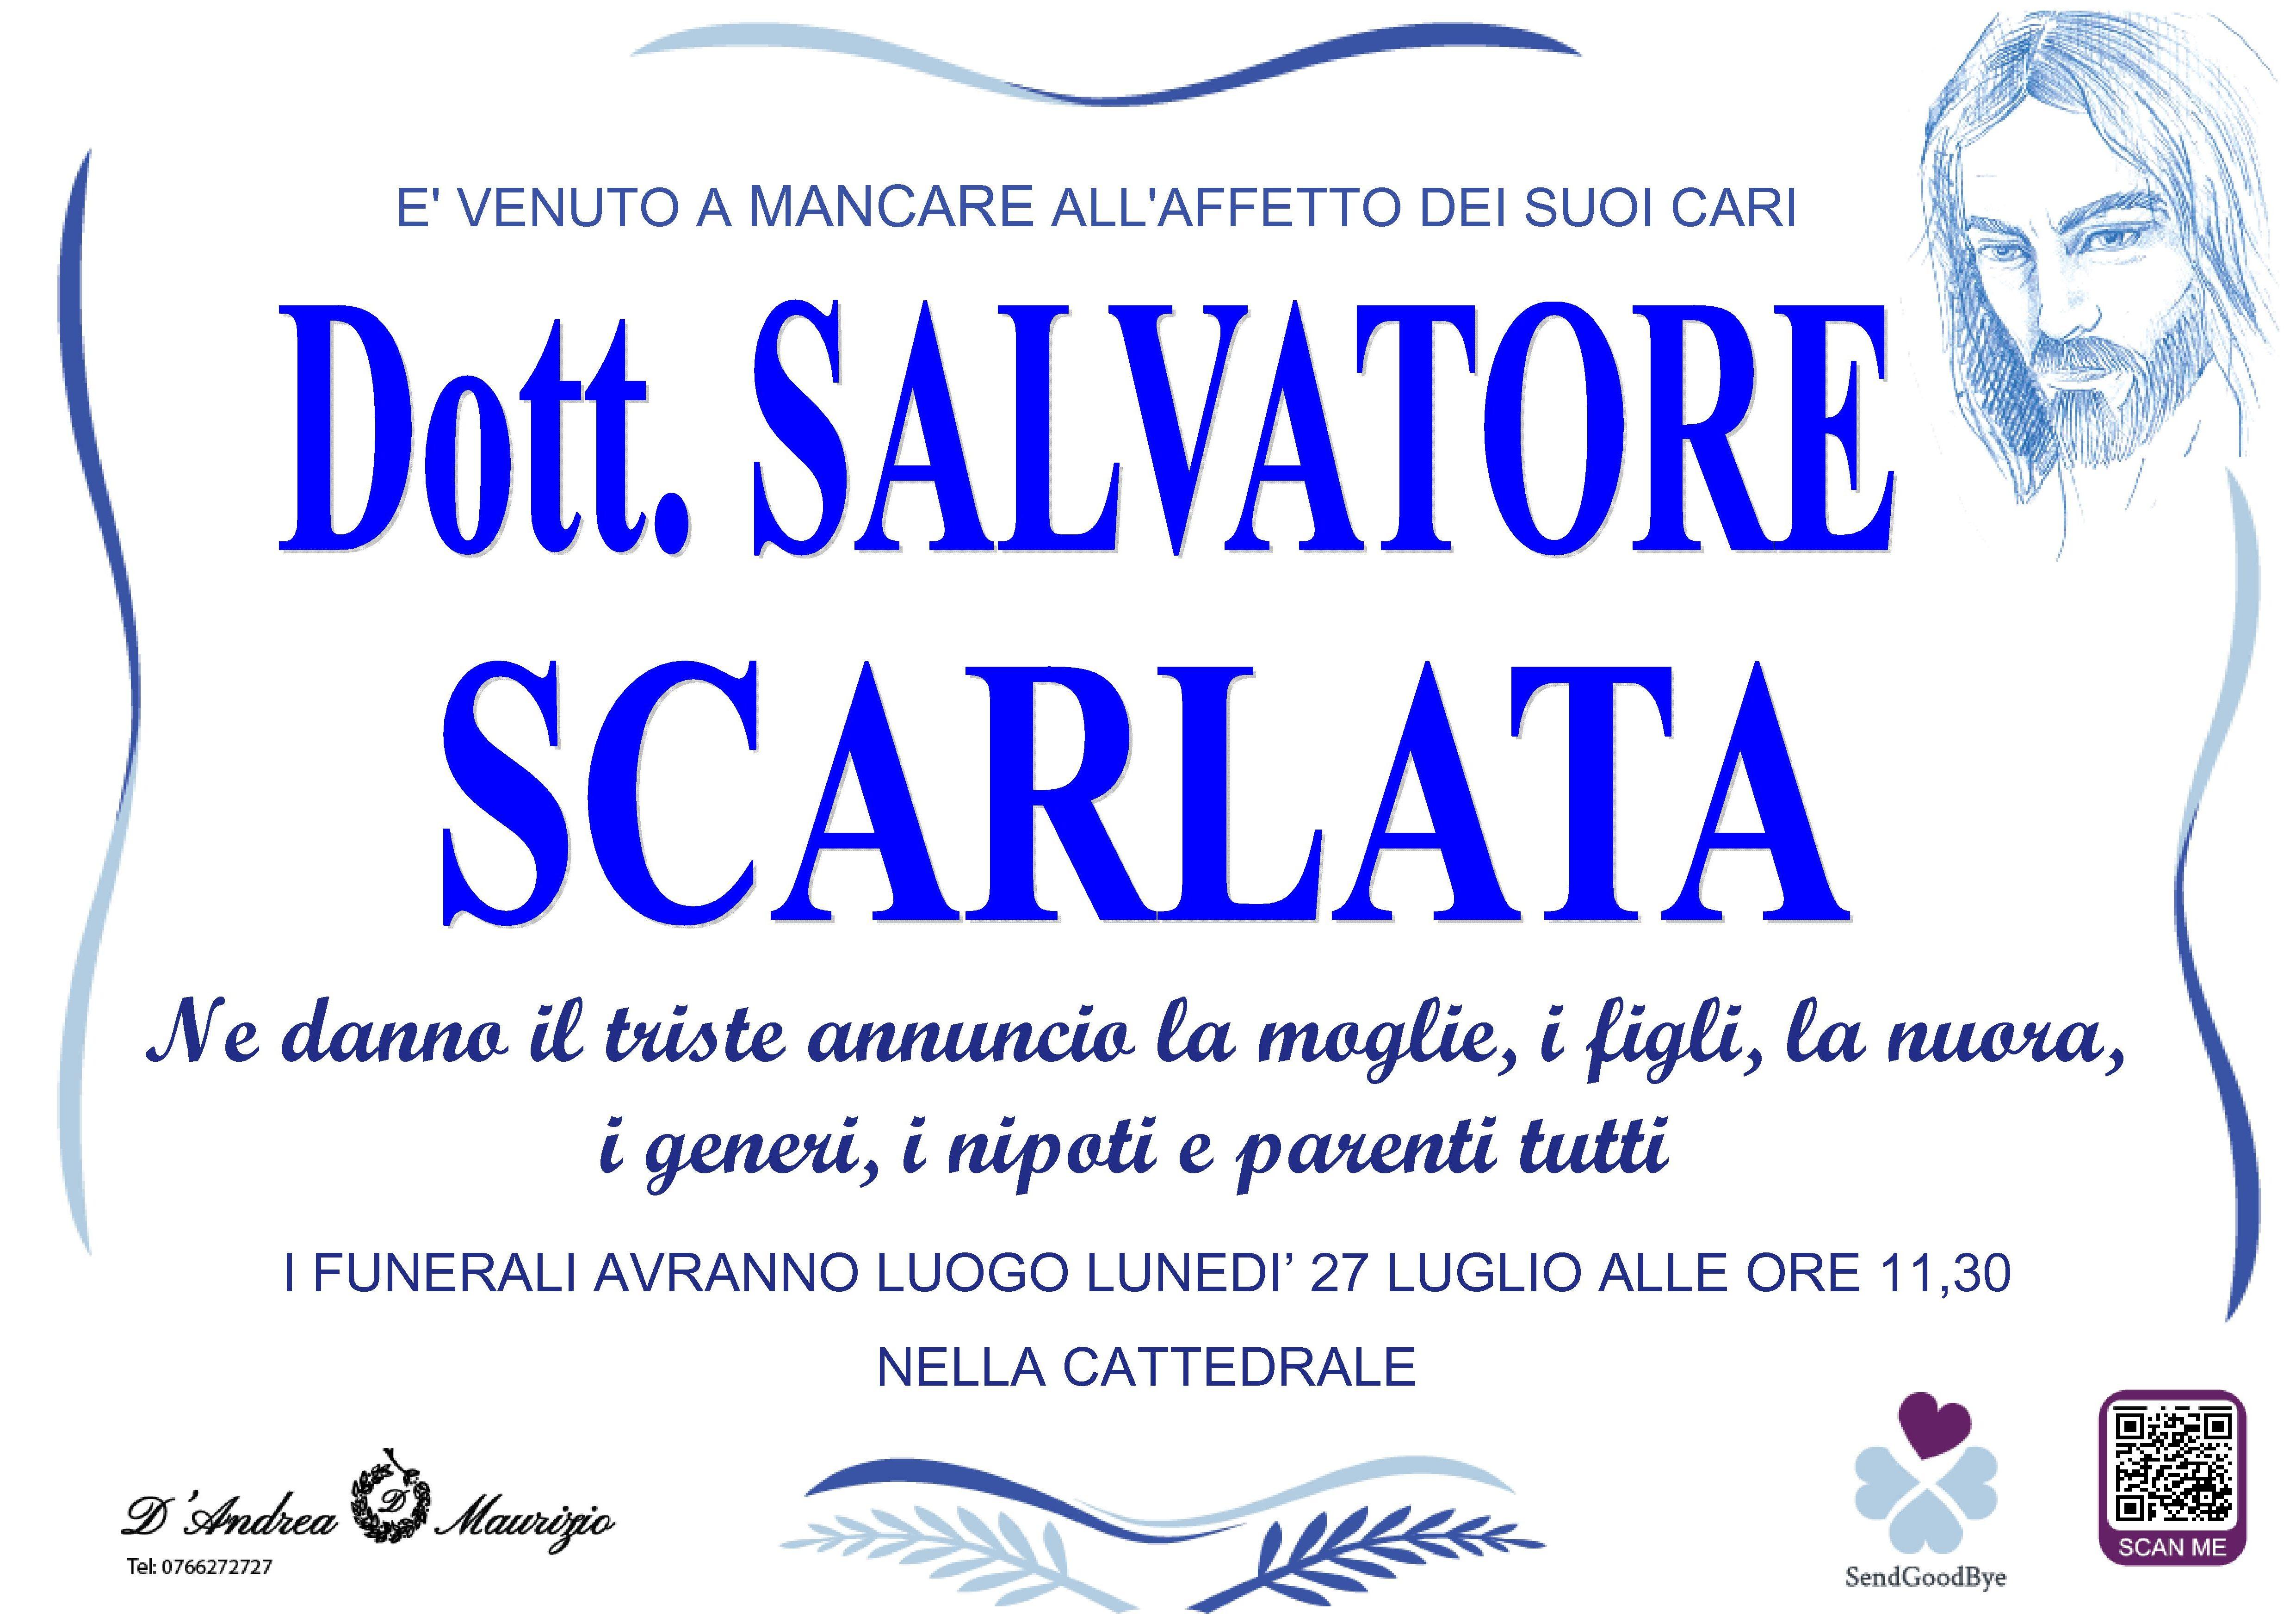 Dott. SALVATORE SCARLATA